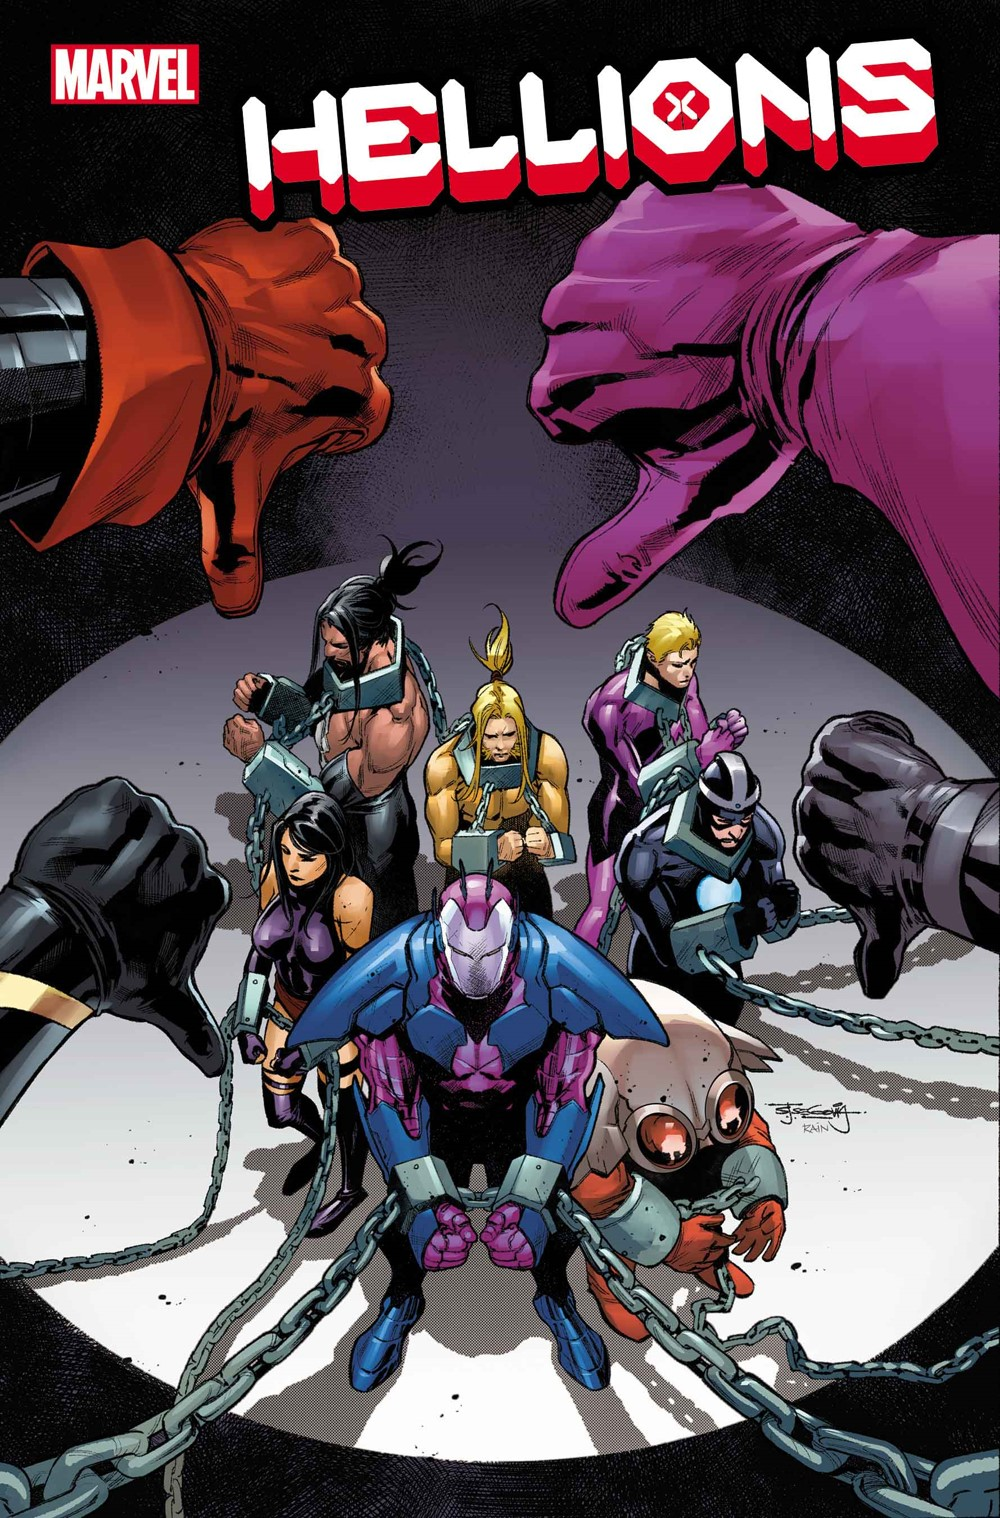 HELLIONS2020018-1 Marvel Comics December 2021 Solicitations